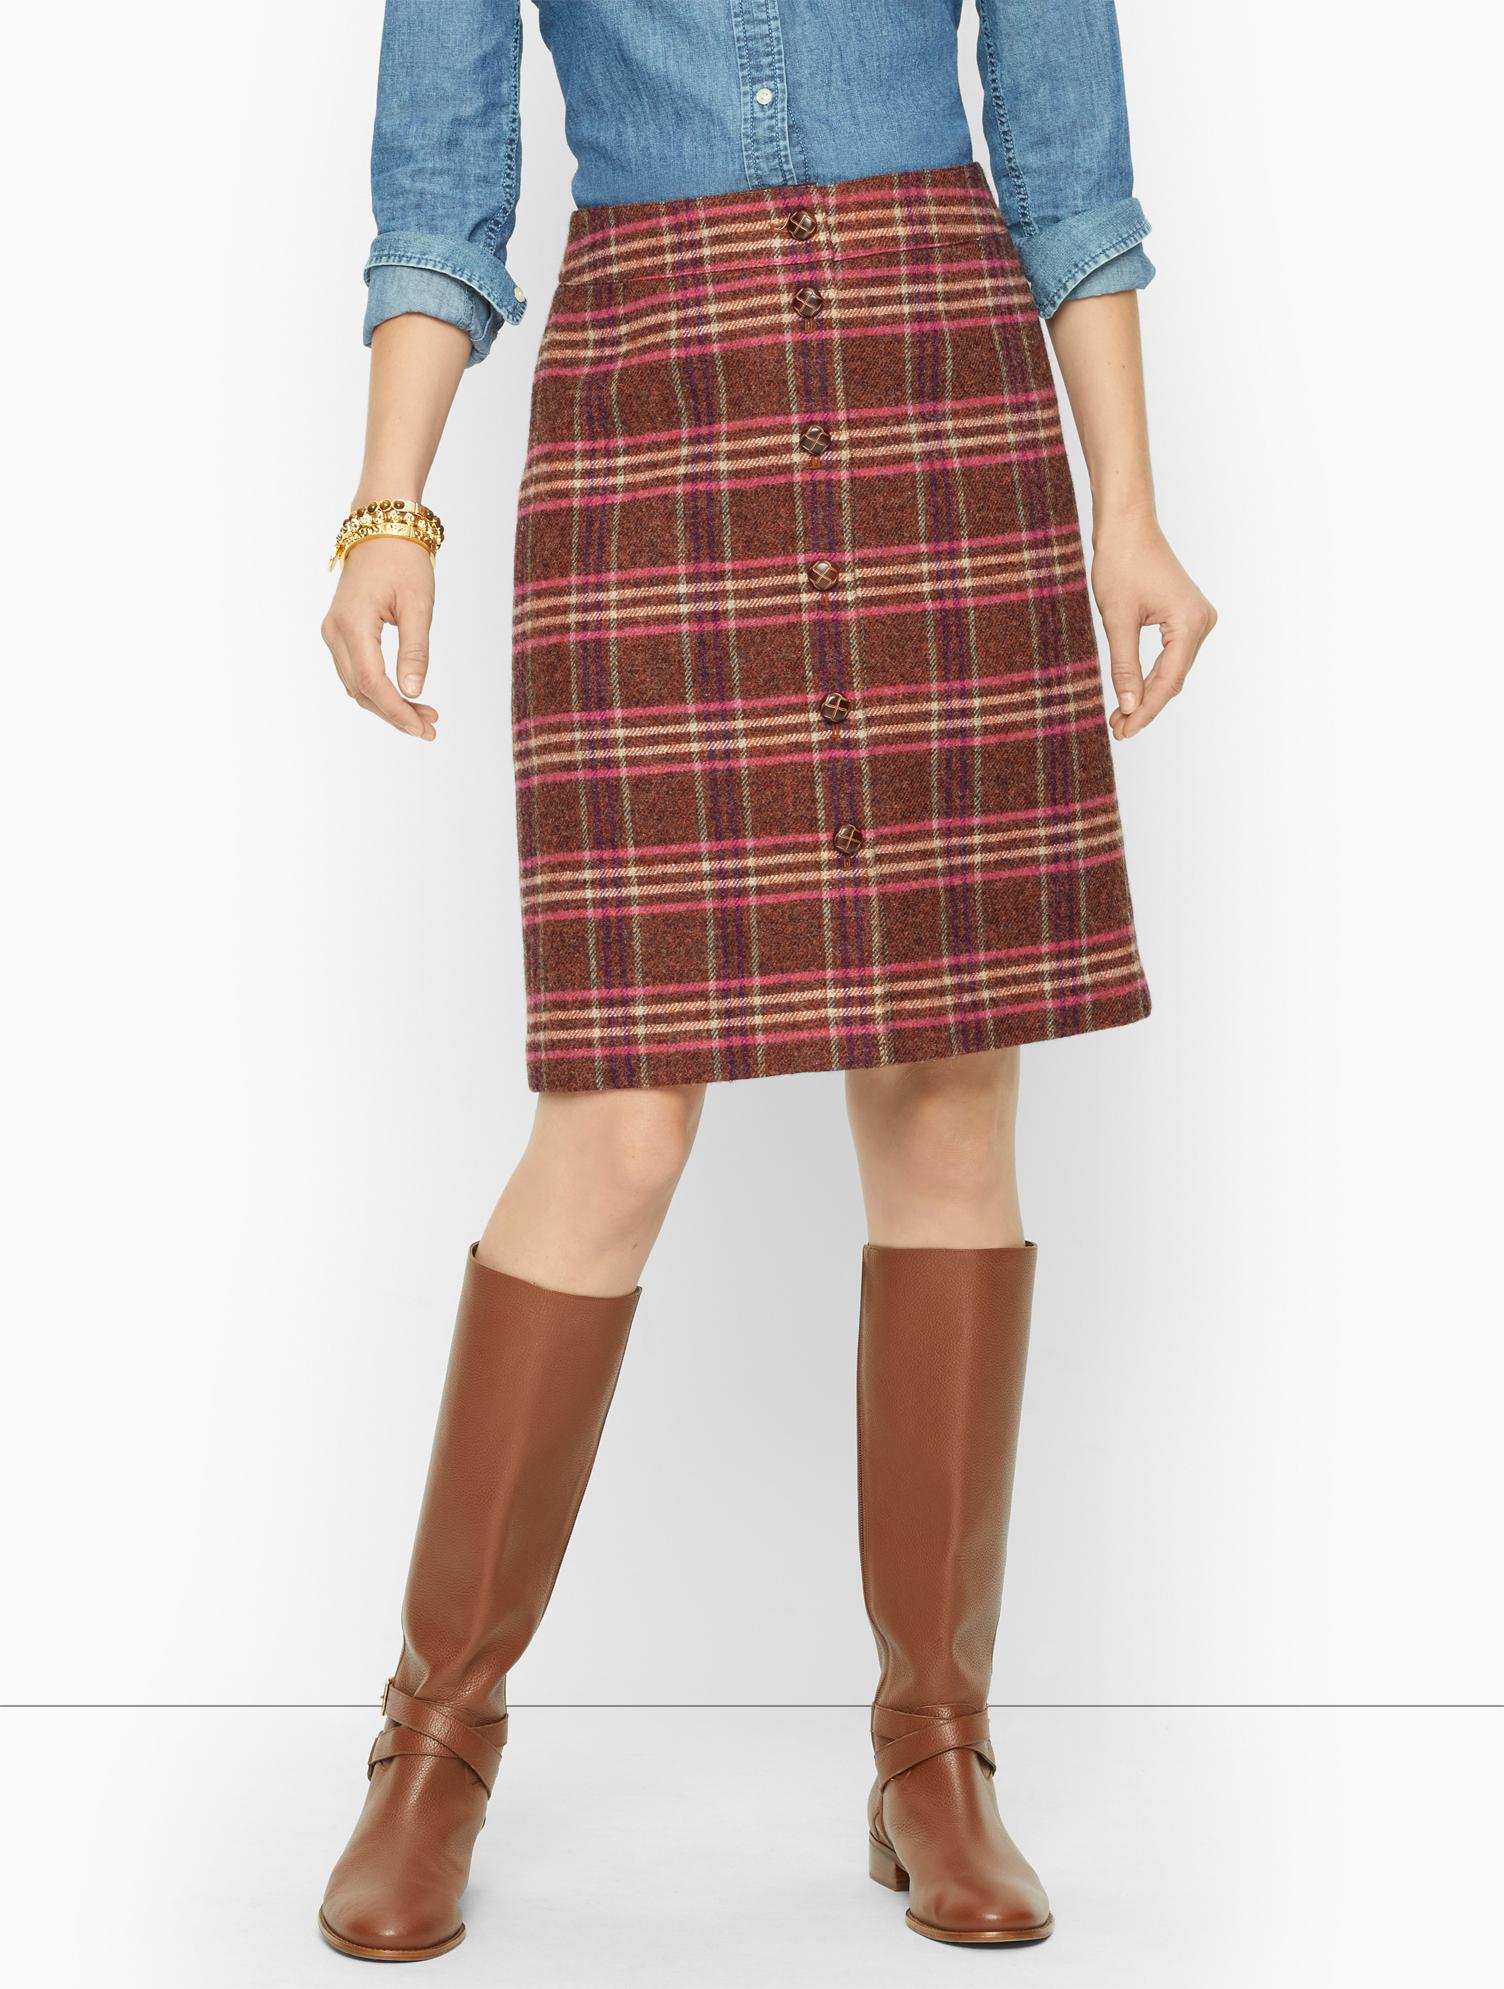 1960s Style Clothing & 60s Fashion Plus Size - Wool Blend A-Line Skirt - OrangePink - 24 Talbots $109.00 AT vintagedancer.com